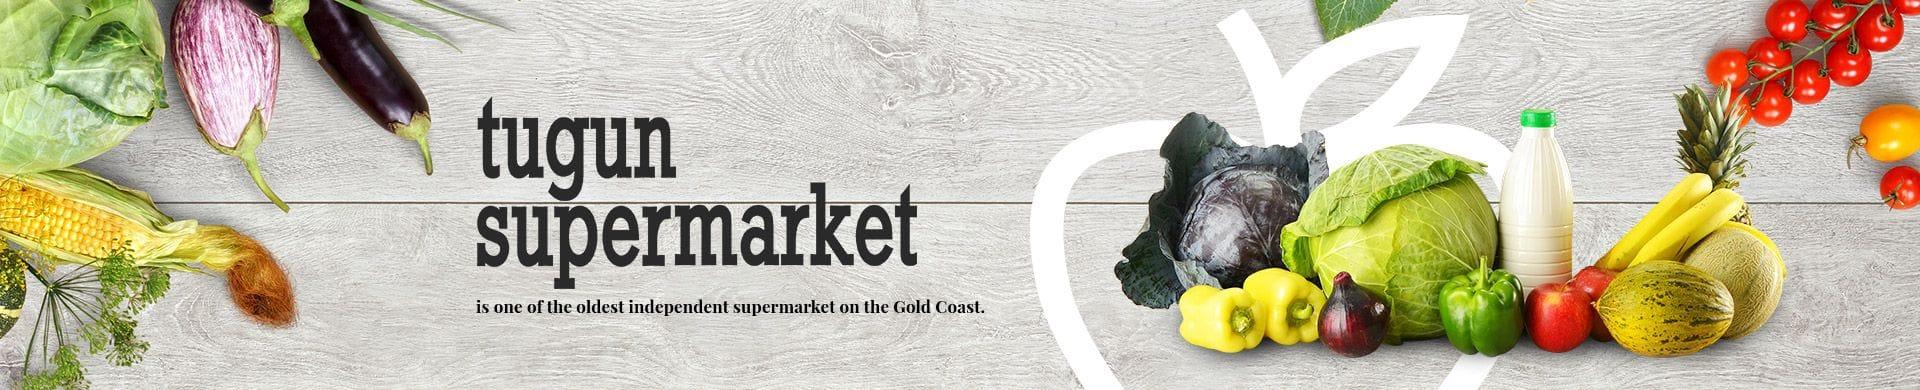 Tugun Super Market Gold Coast